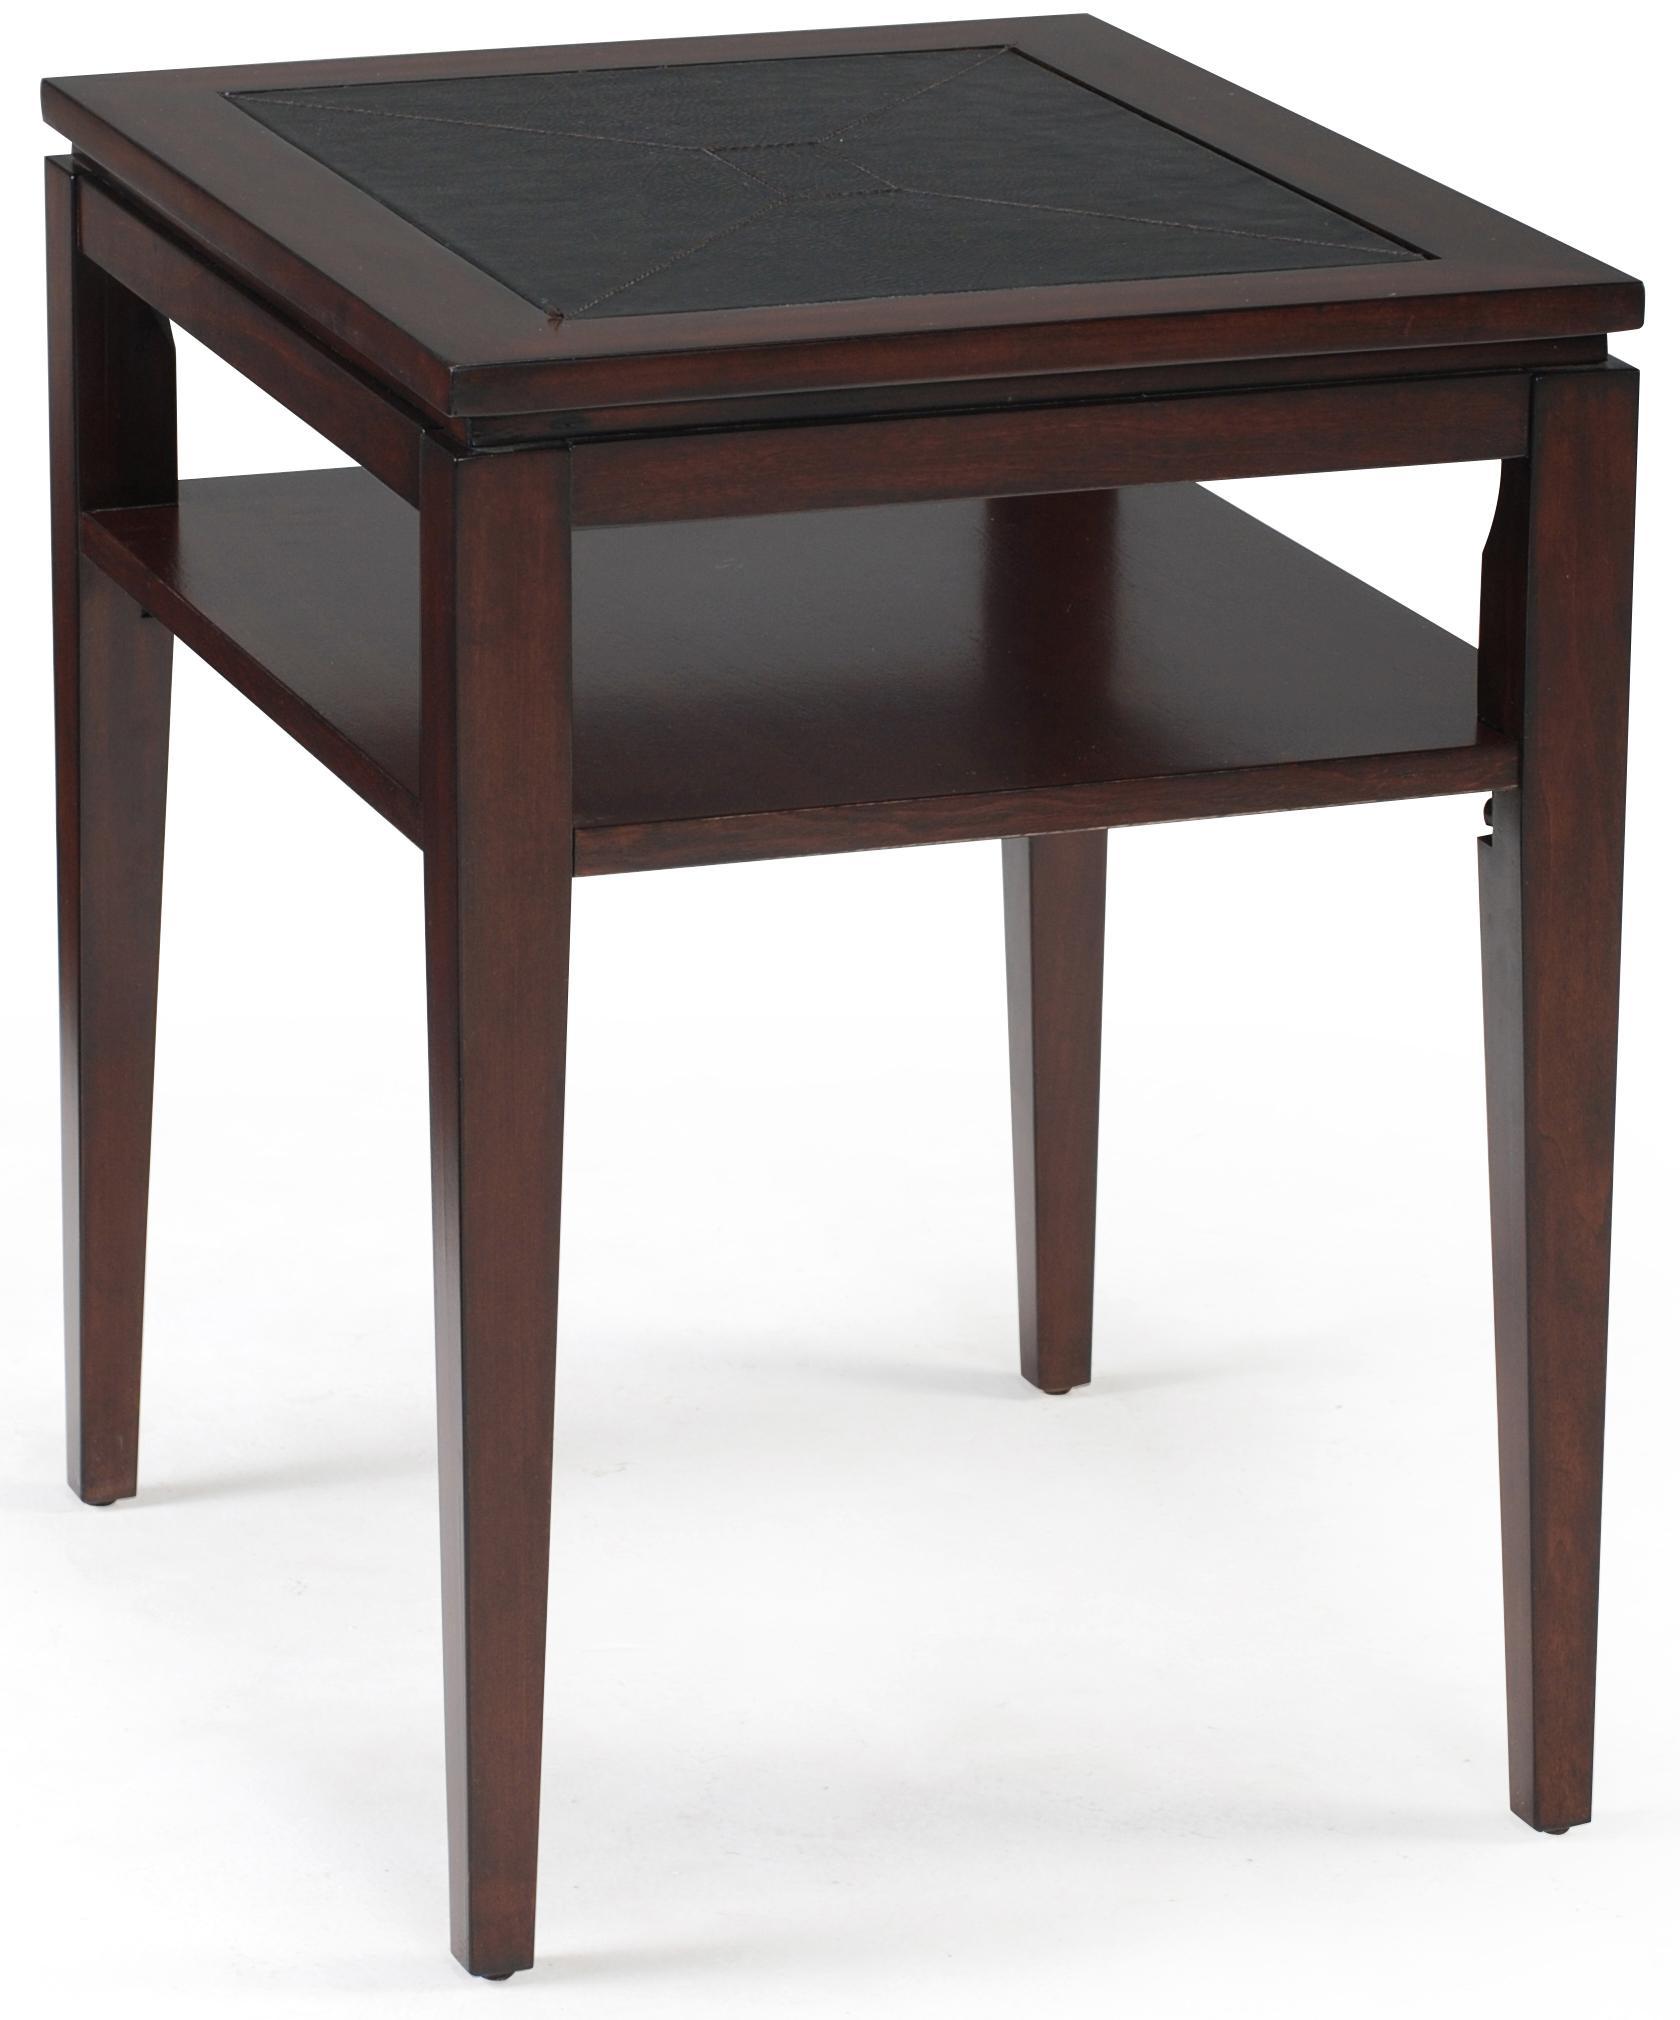 Magnussen Home Micah Rectangular End Table - Item Number: T1508-03